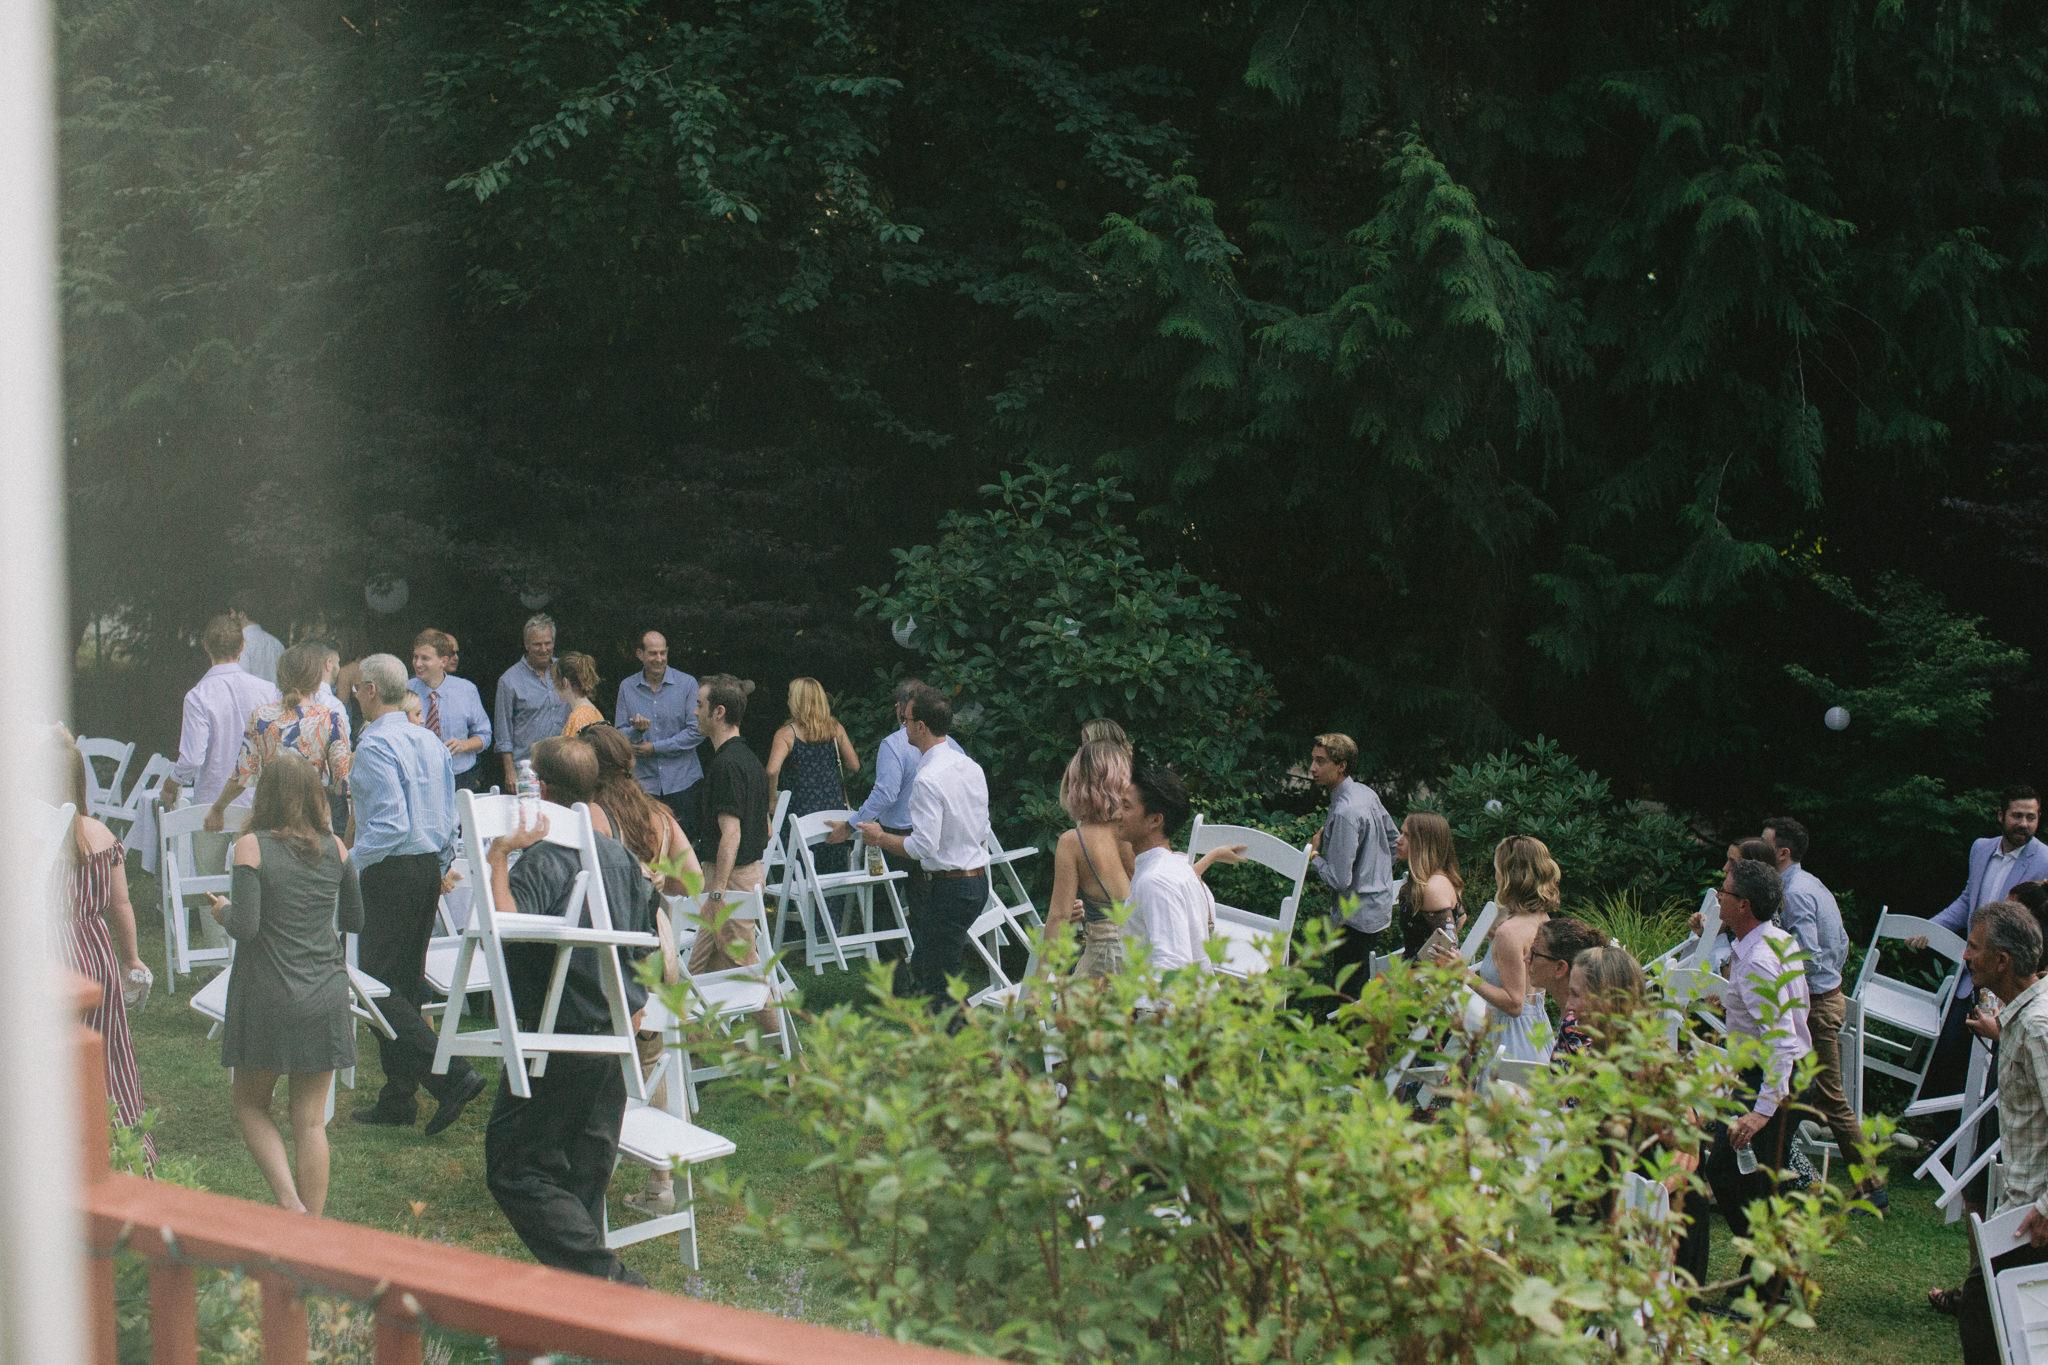 Backyard-Bainbridge-Island-Wedding-Alycia-Lovell-Photography-126.JPG